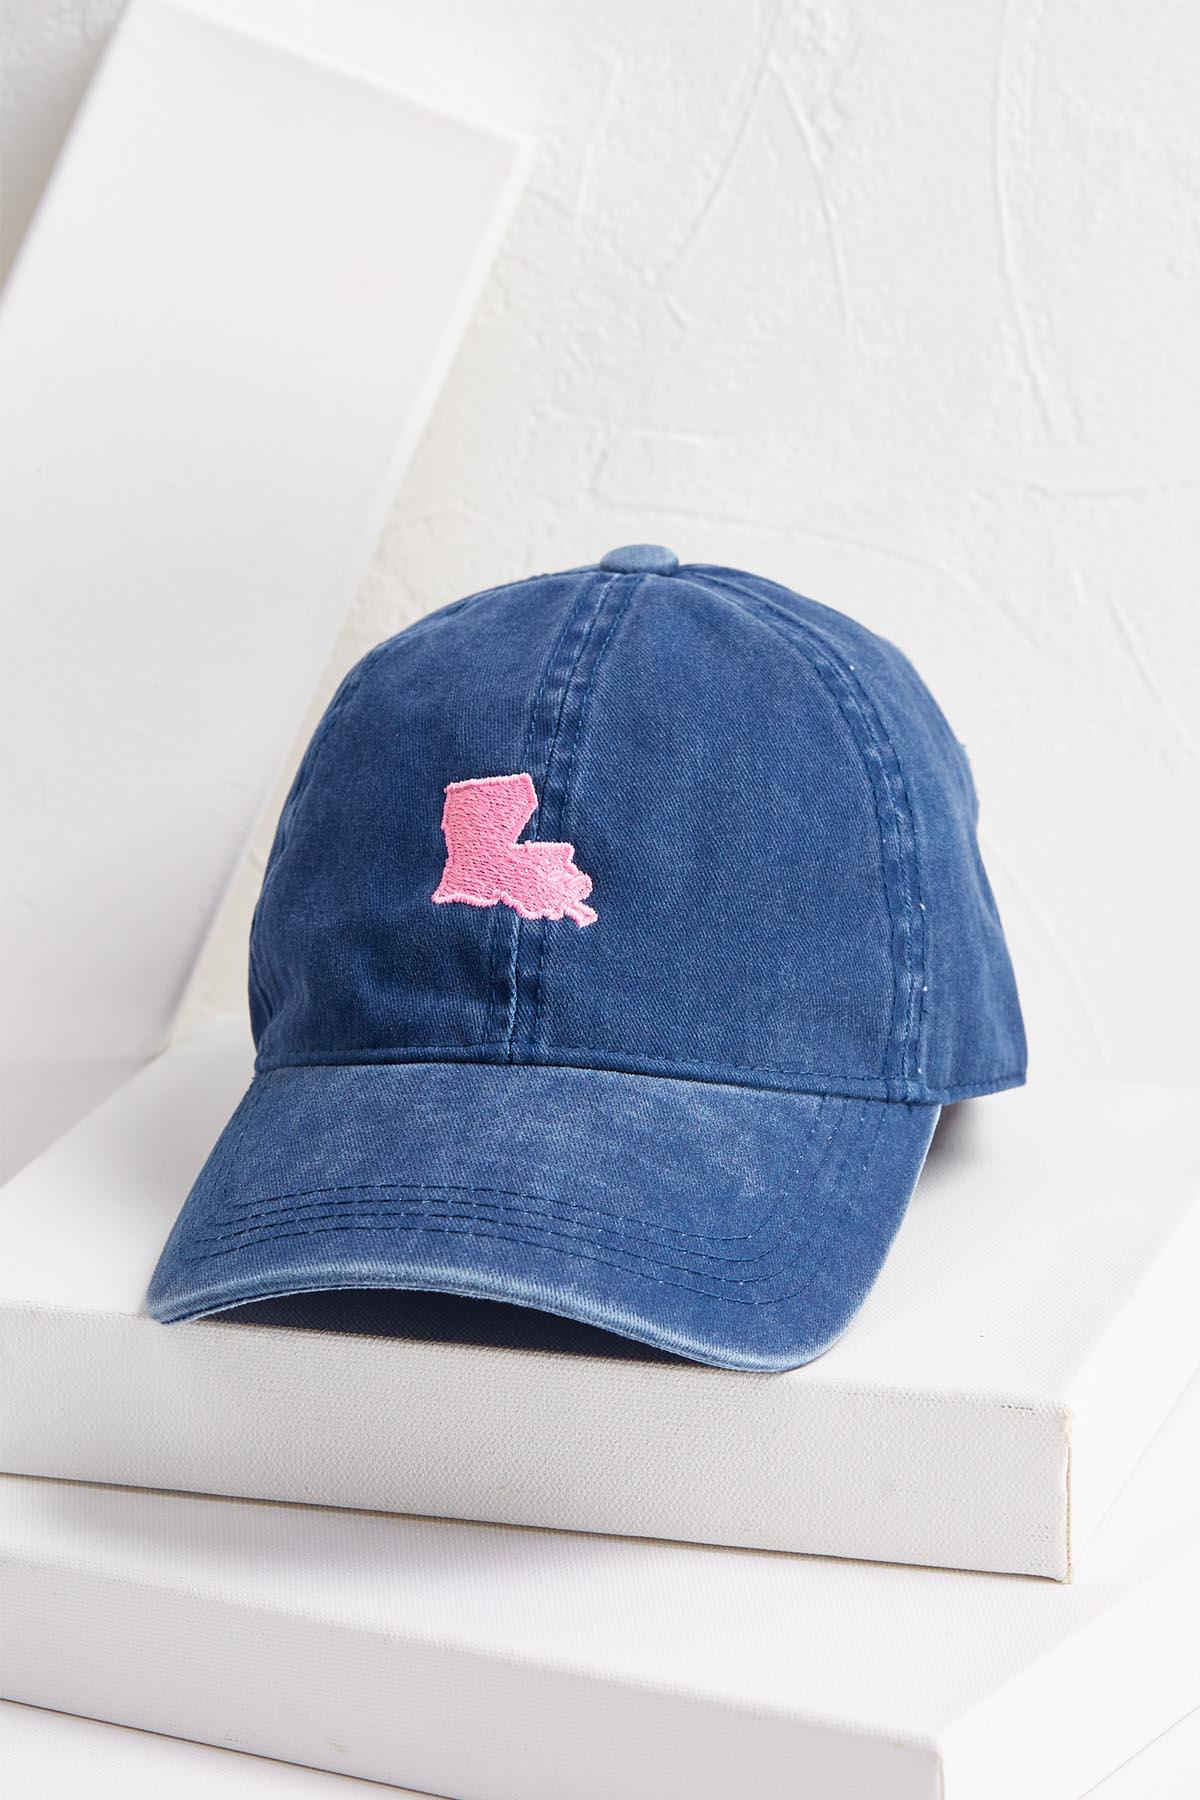 Louisiana Baseball Hat